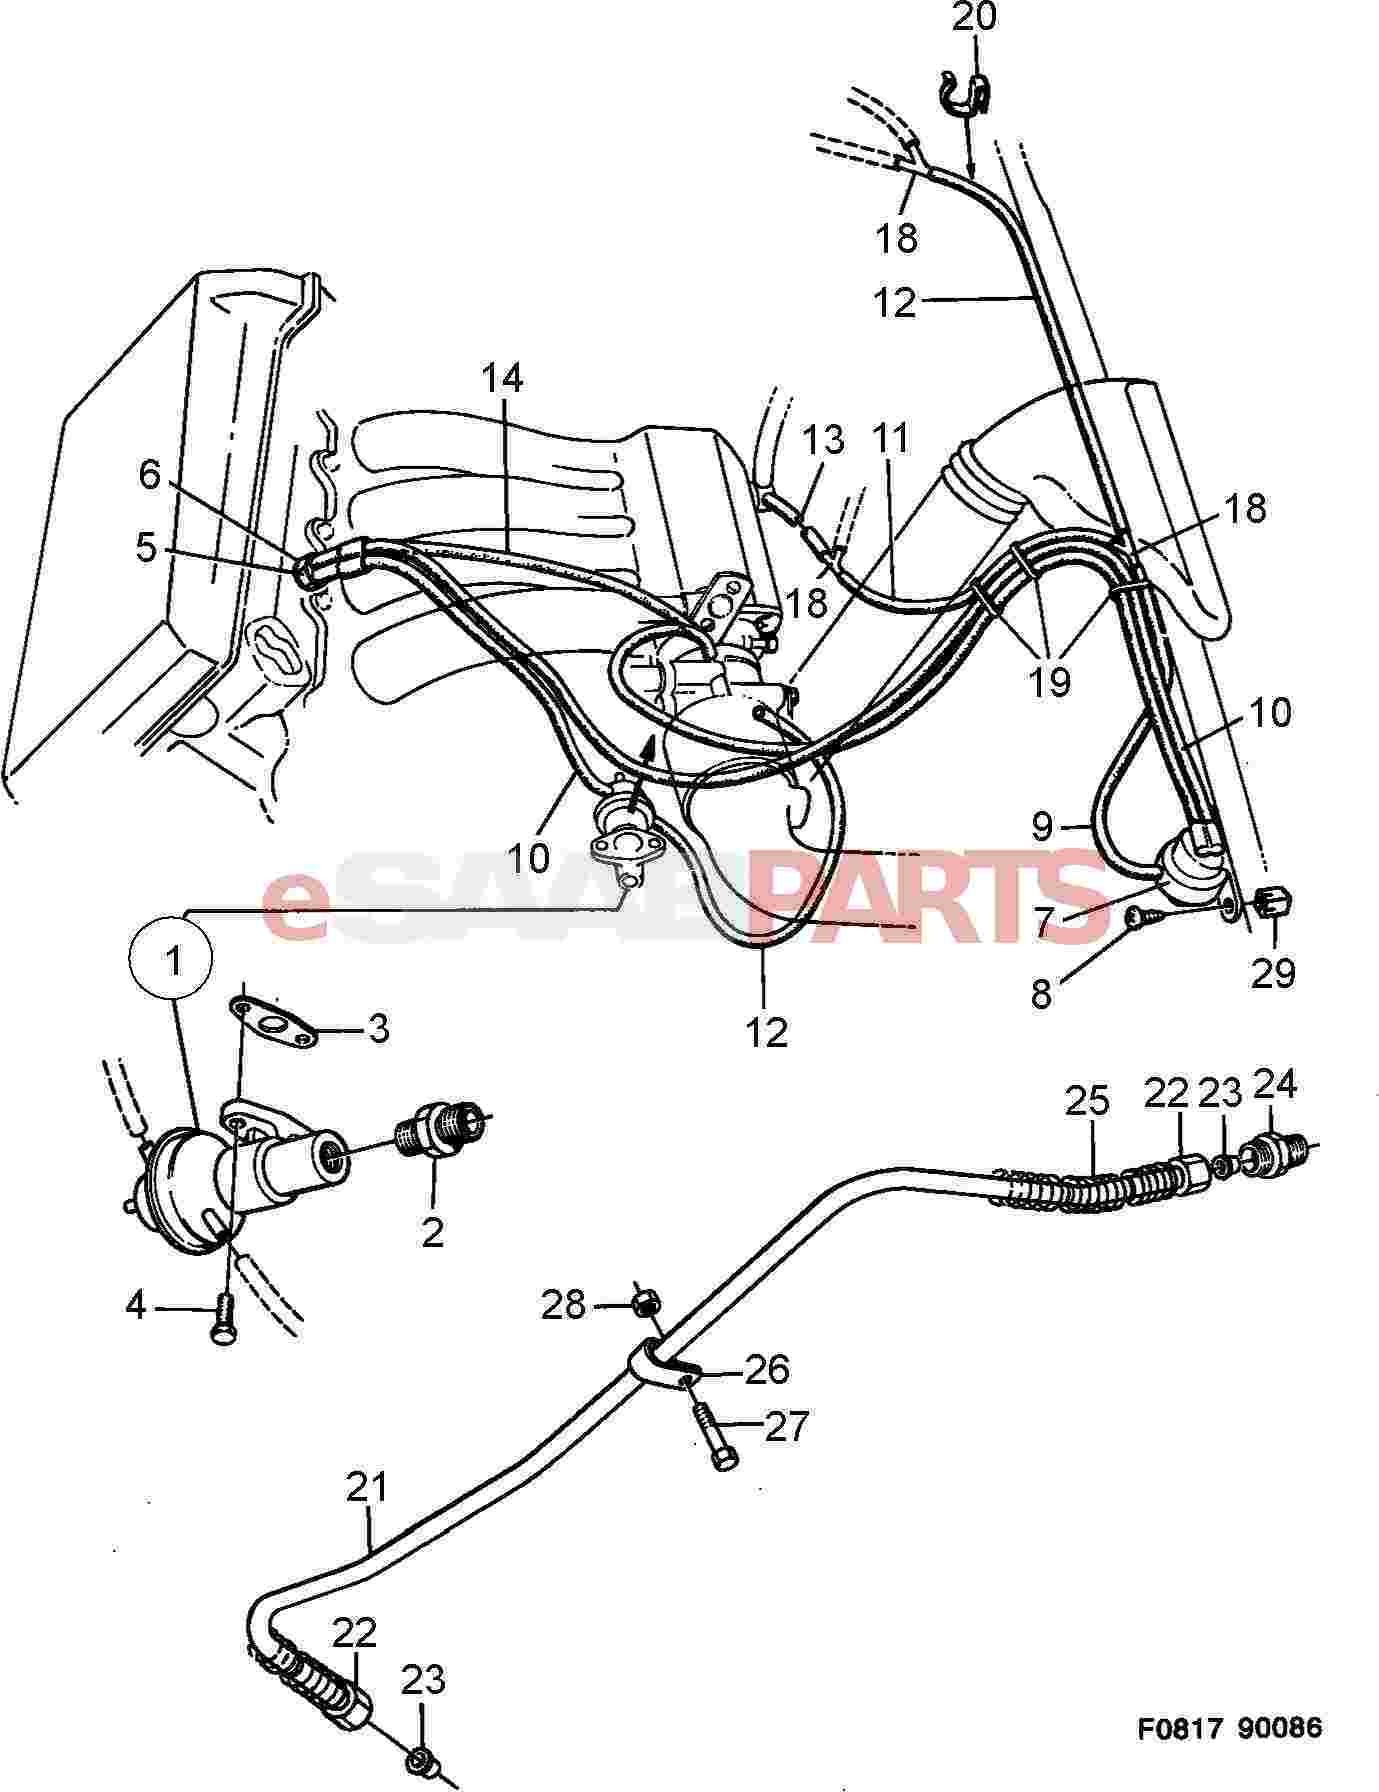 Saab 900 se engine diagram application wiring diagram u2022 rh diagram today 1992 toyota pickup coolant system diagram 1992 toyota pickup coolant system